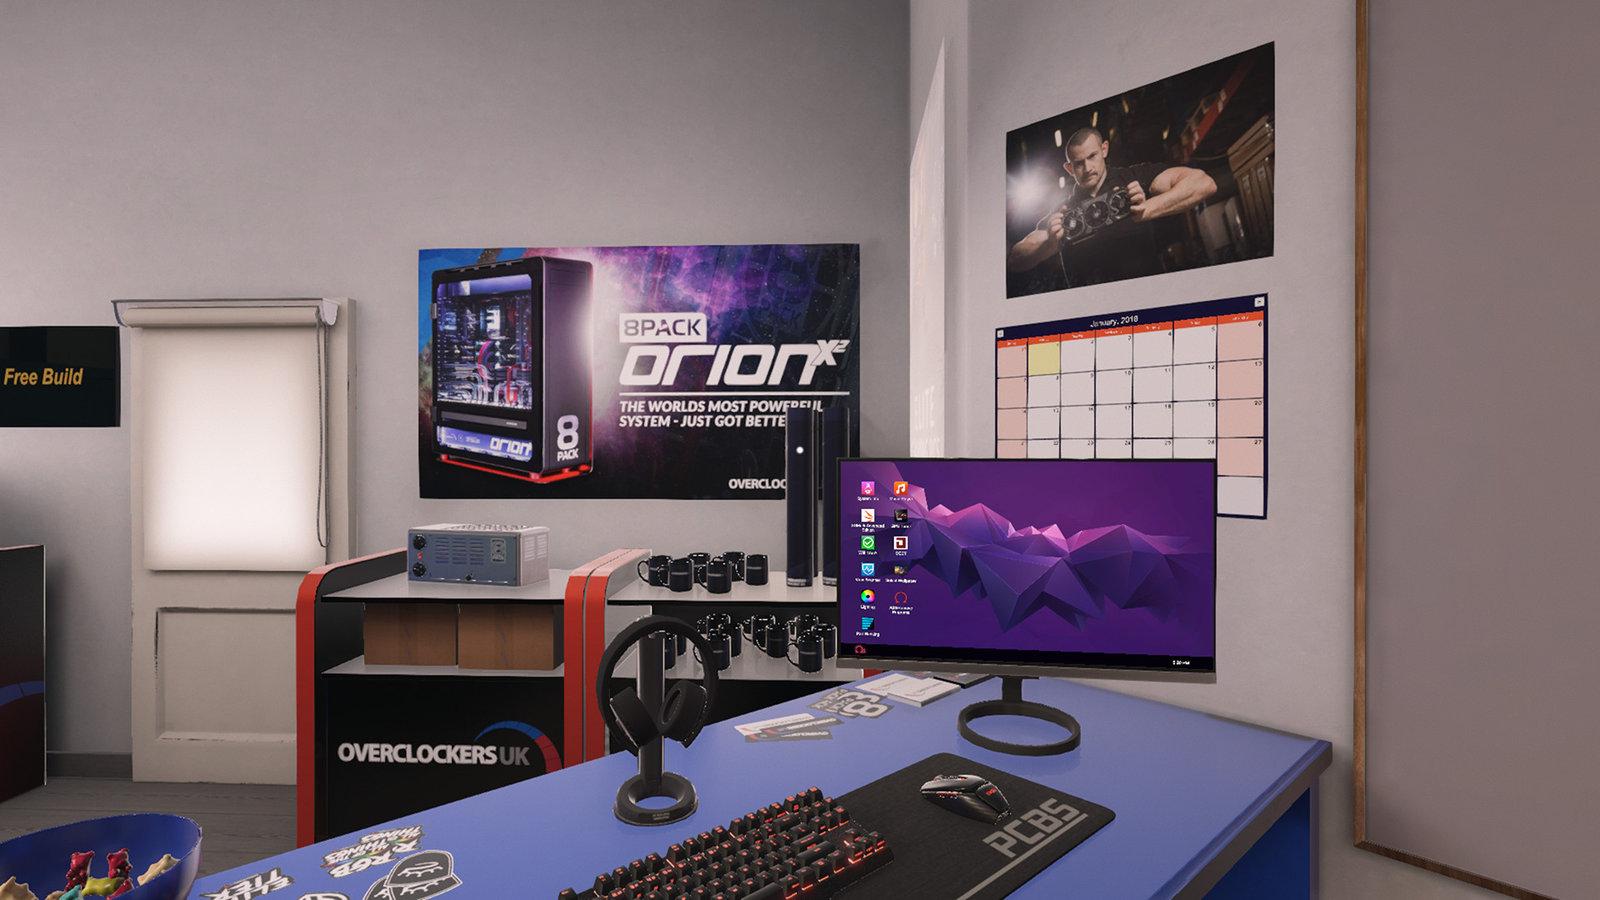 PC Building Simulator - Overclockers UK Workshop image 1